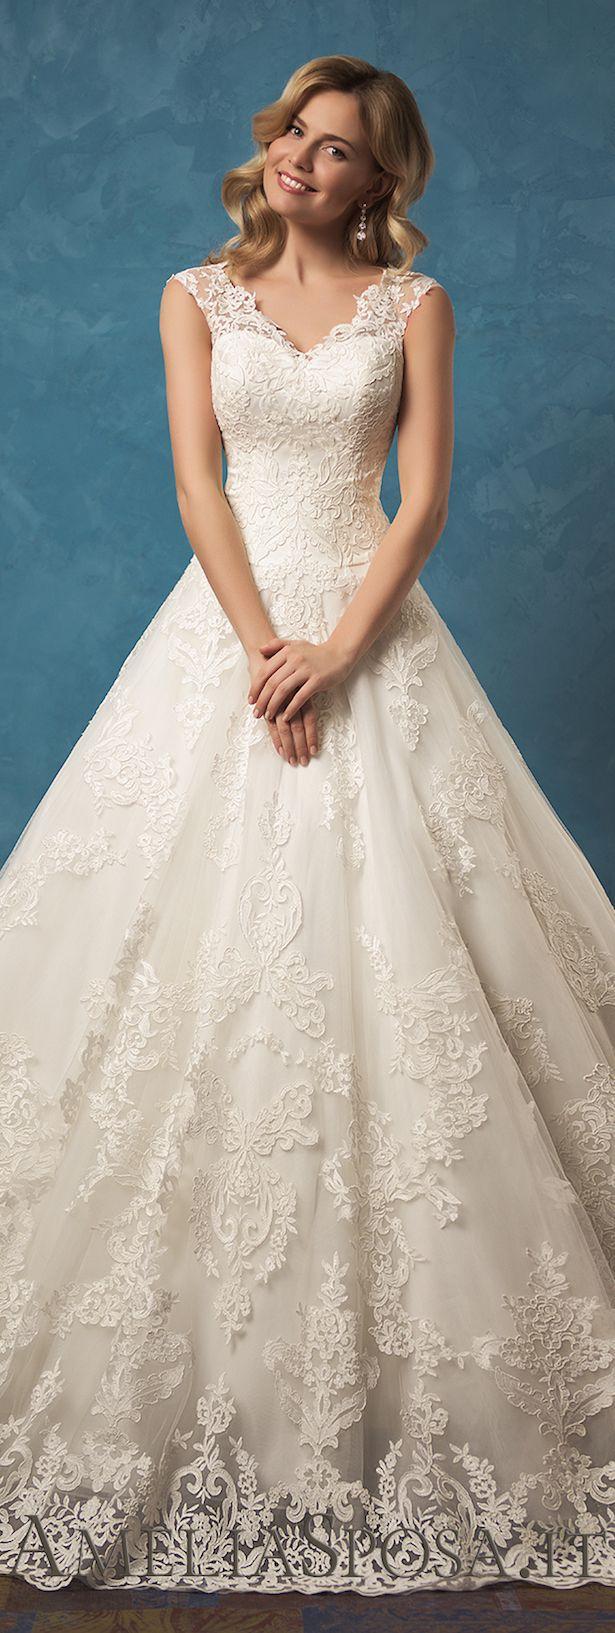 Wedding-Dresses-0594